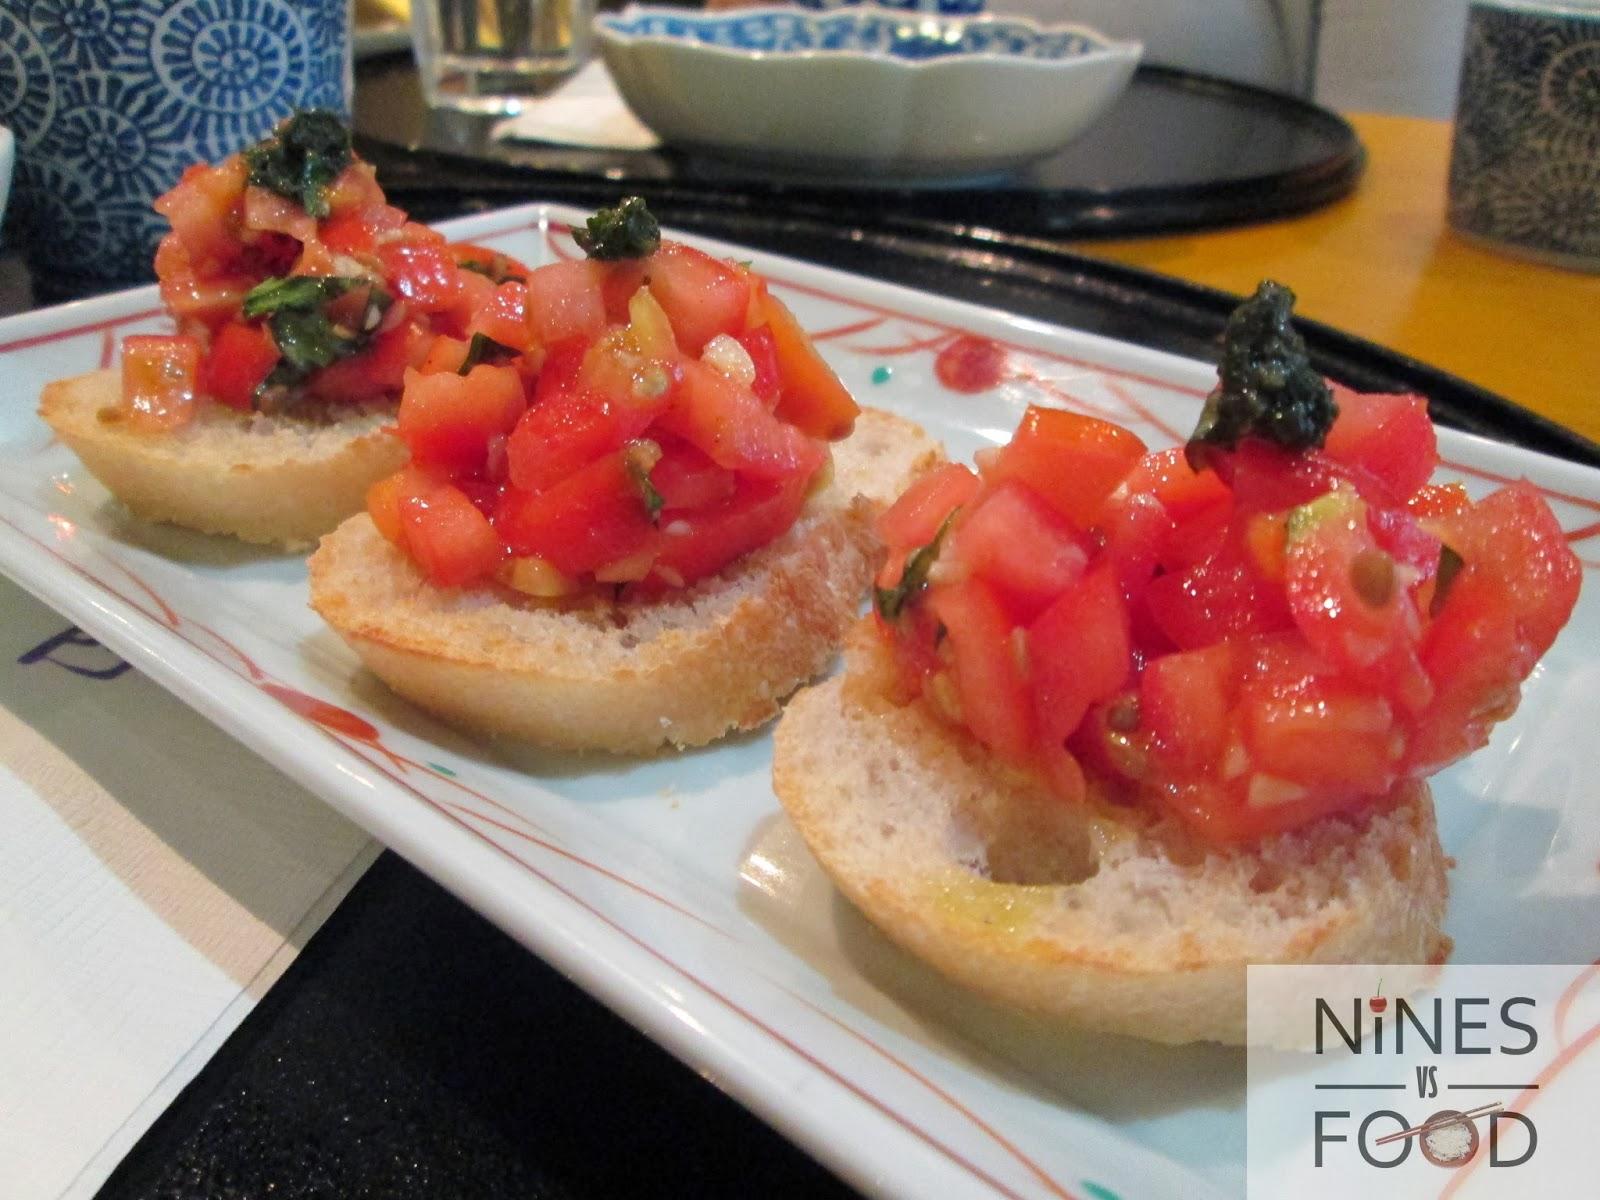 Nines vs. Food - Yomenya Goemon Greenbelt 3 - 3.jpg